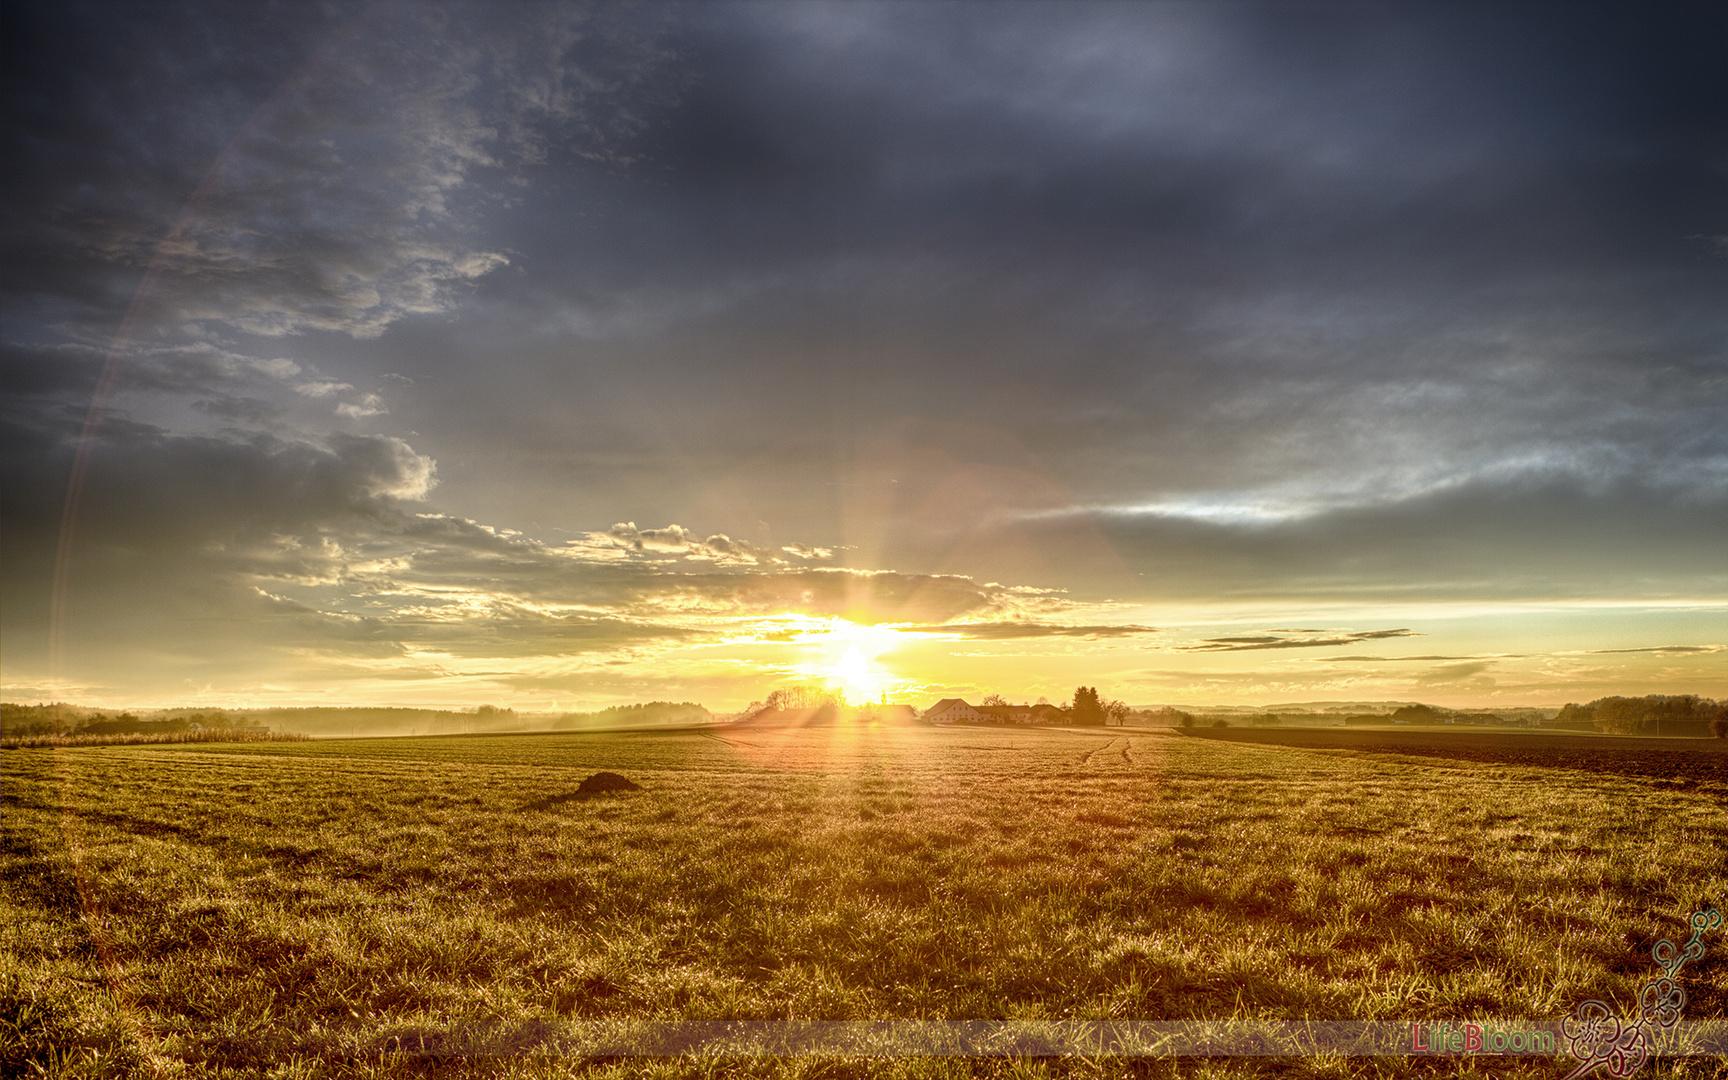 Goldener Sonnenuntergang nach heftigem Gewitter (HDR)